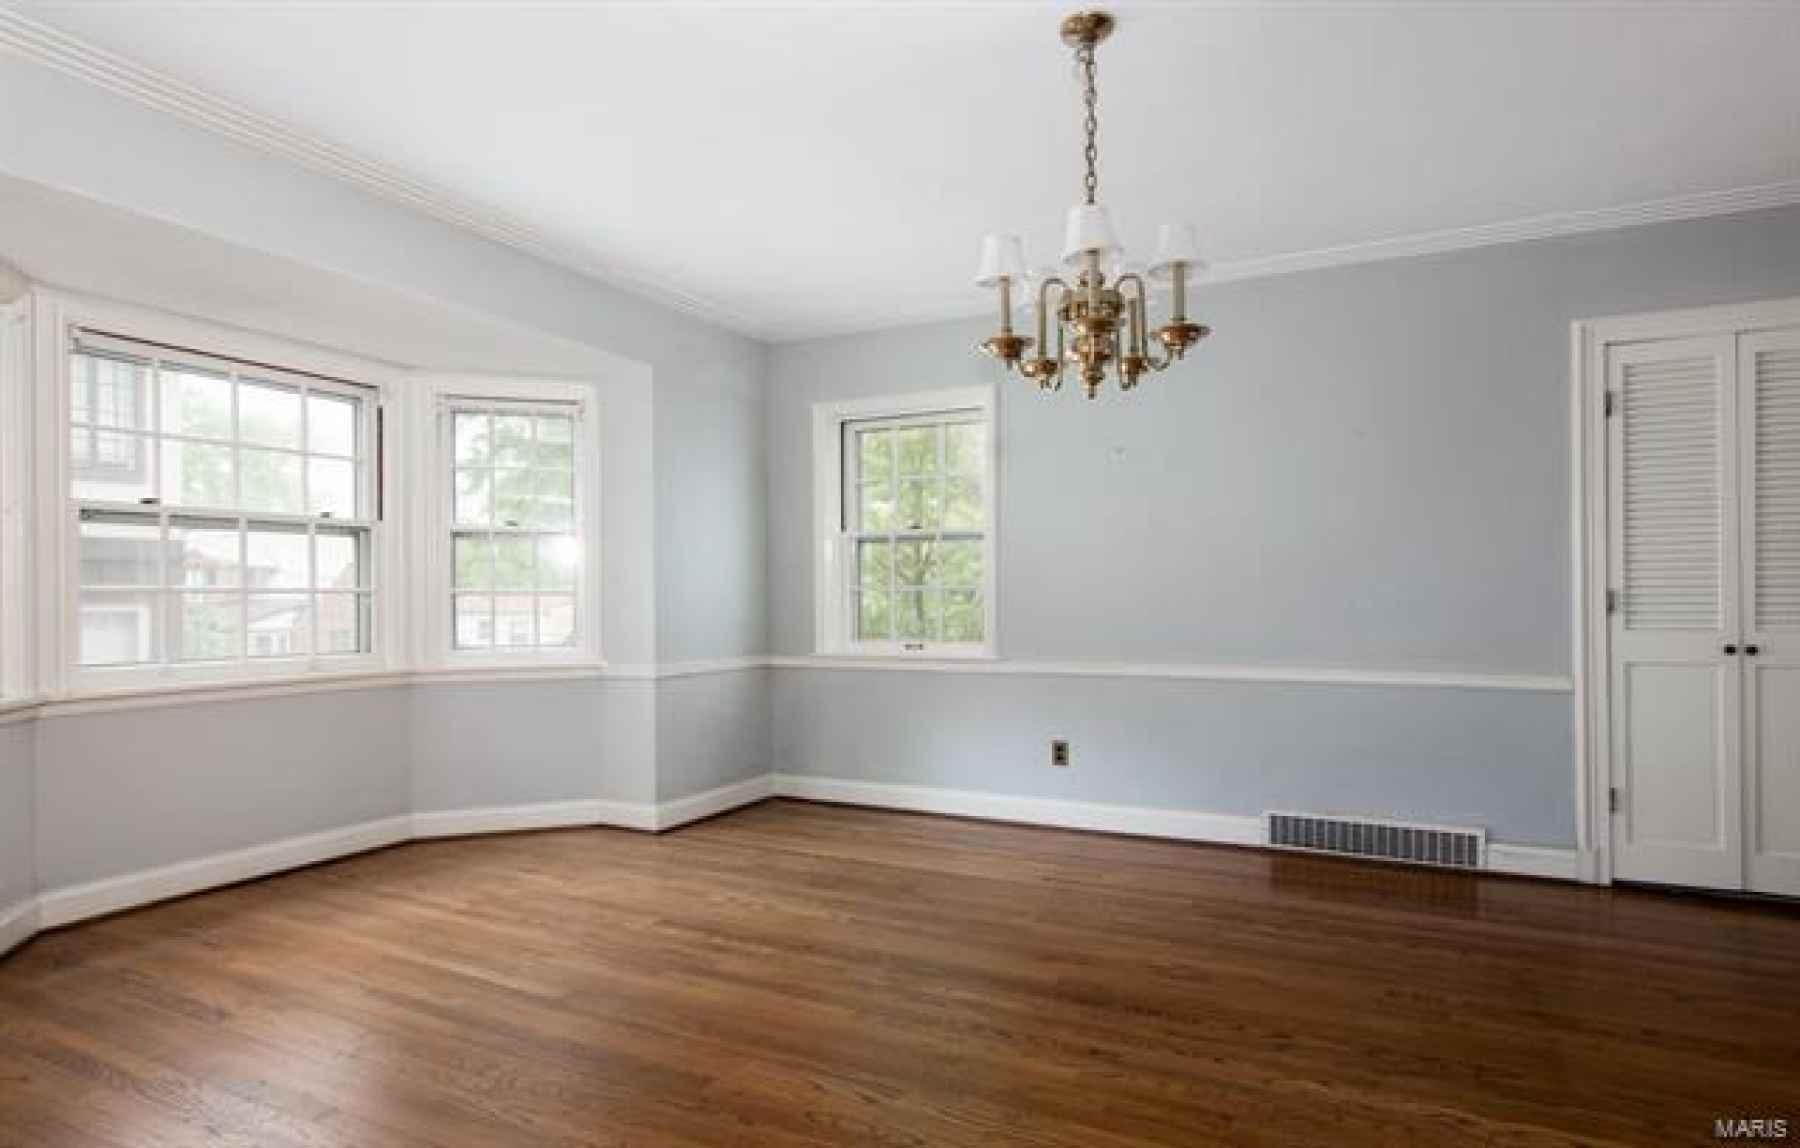 Dining Room Features Bay Window, Pantry, Hardwood Floors